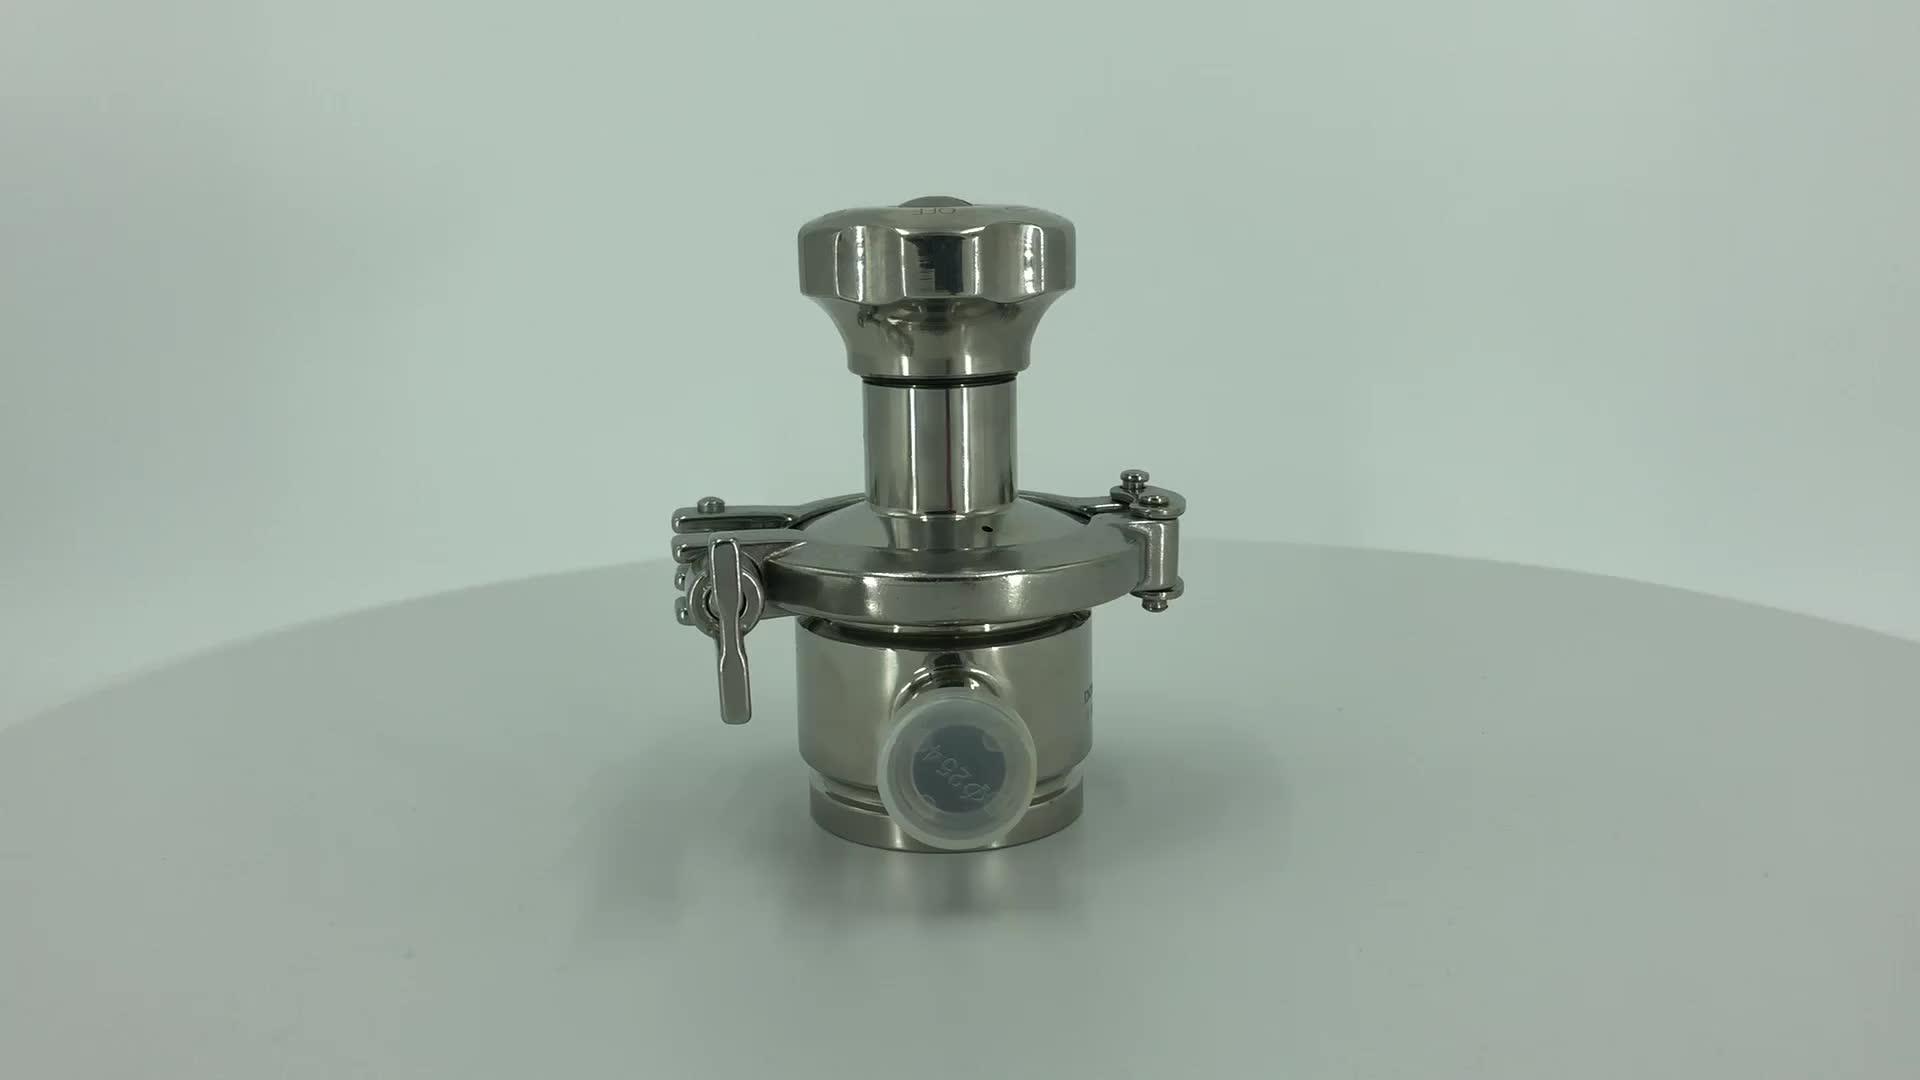 Stainless steel sanitary manual radial tank bottom diaphragm valve